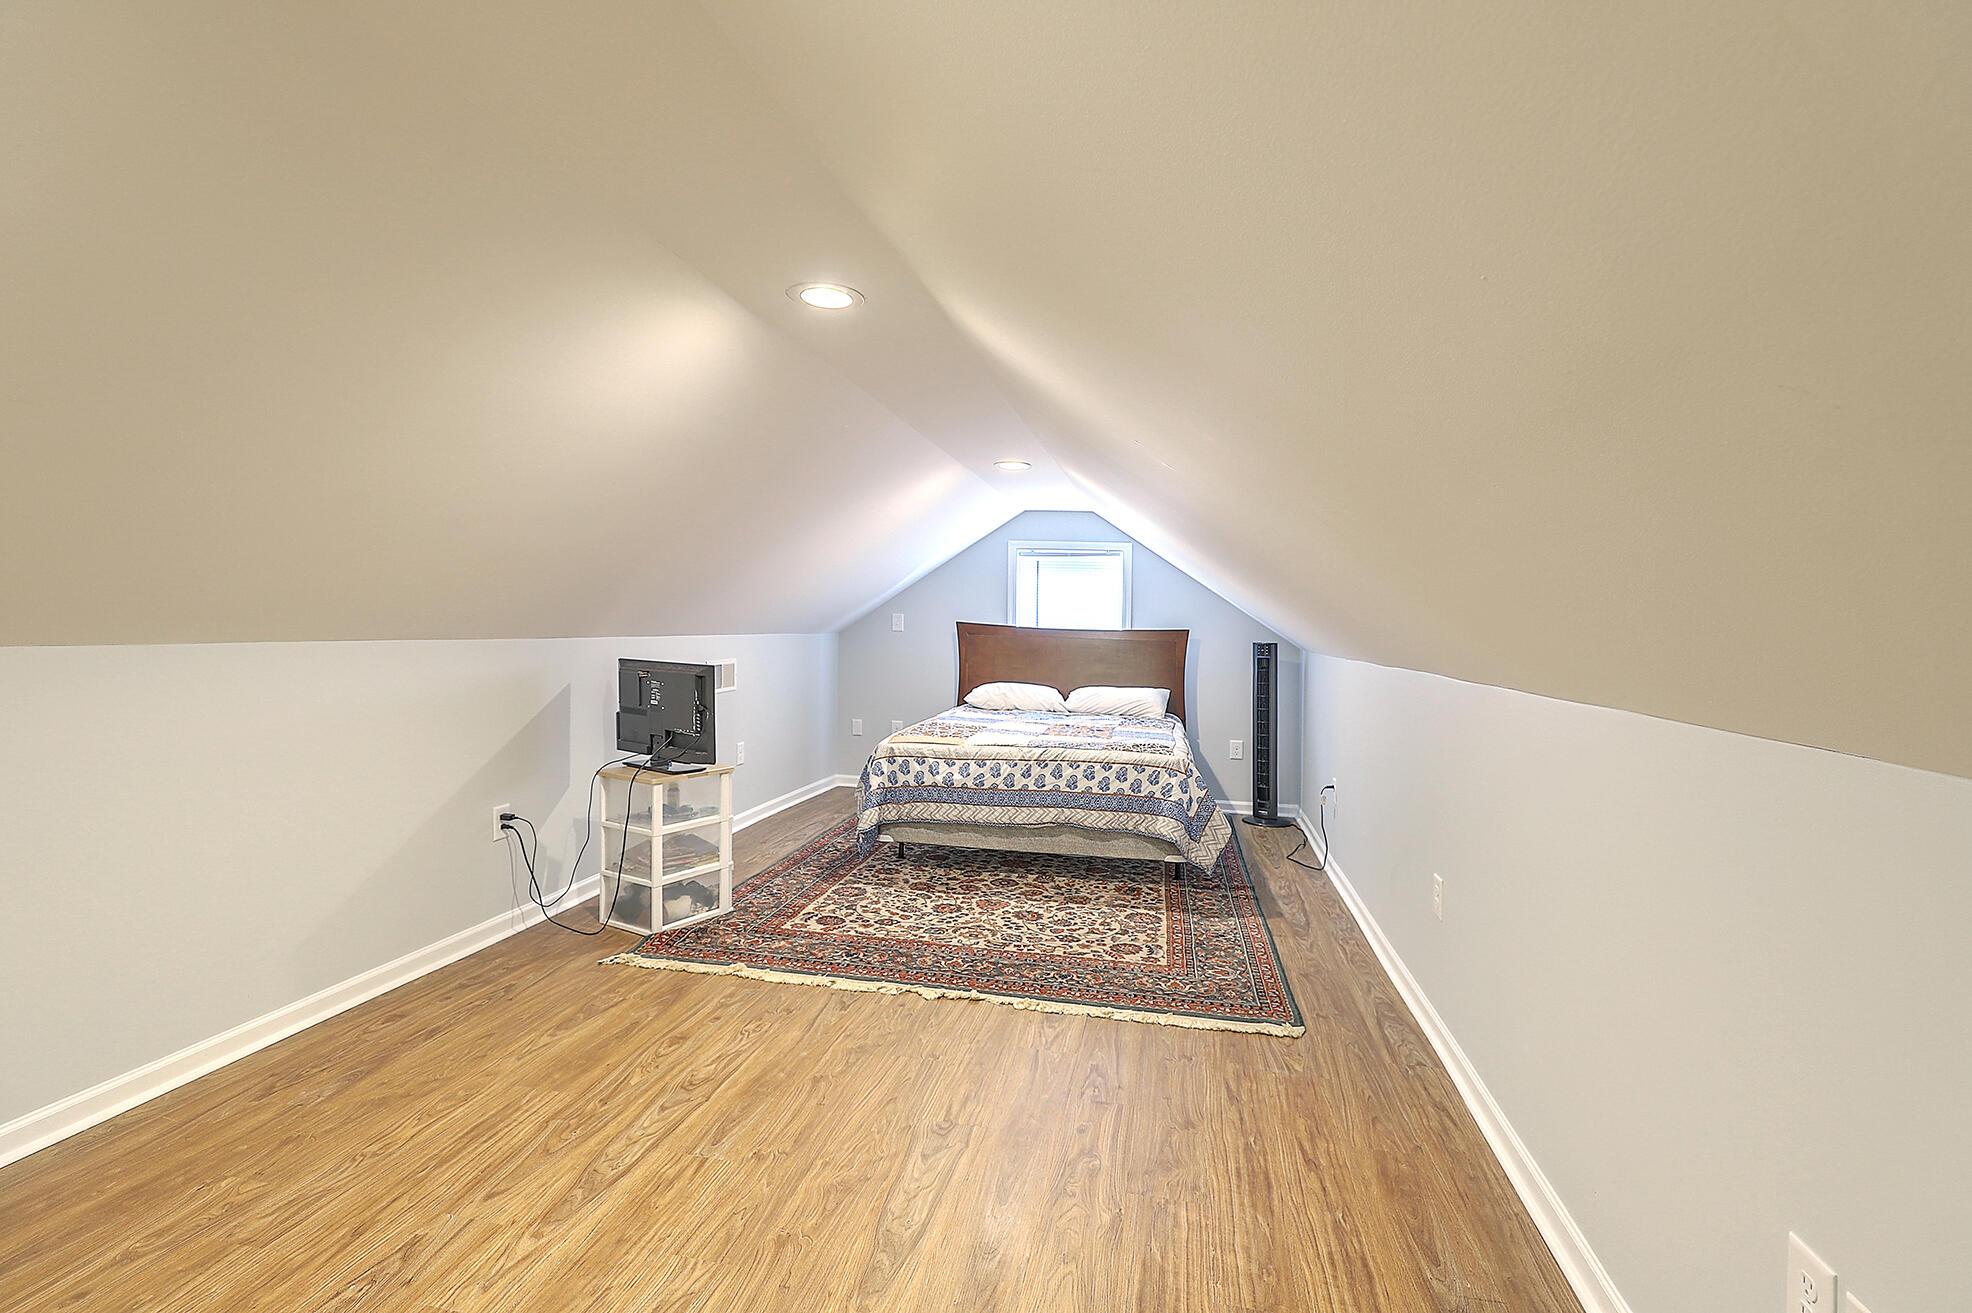 Summerville Homes For Sale - 102 Hickory, Summerville, SC - 75